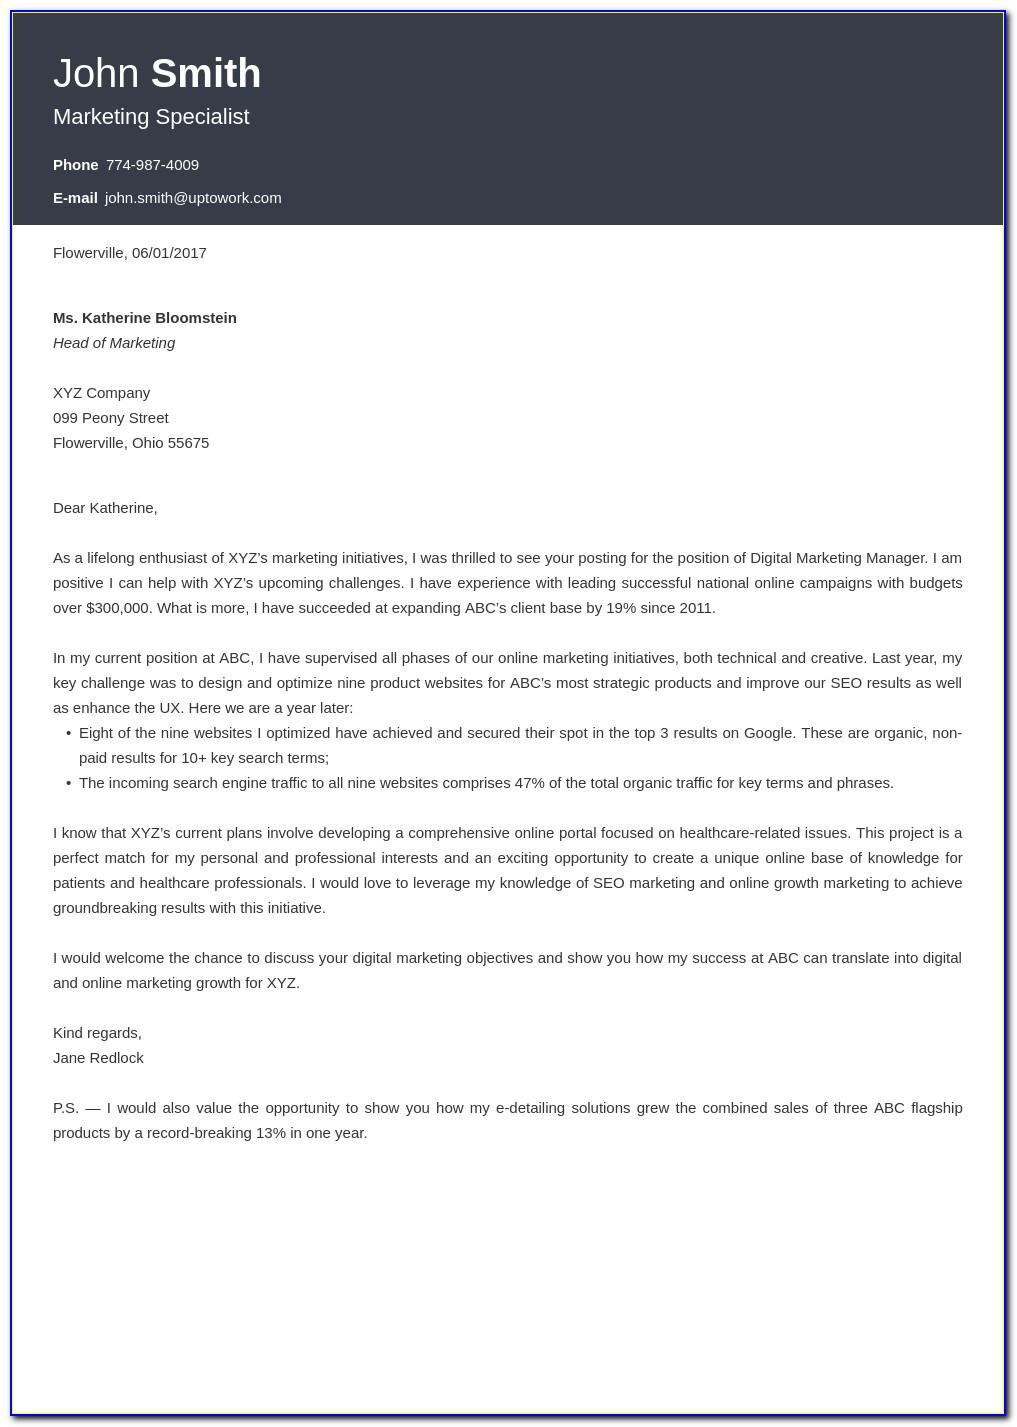 Free Cv Cover Letter Template Uk